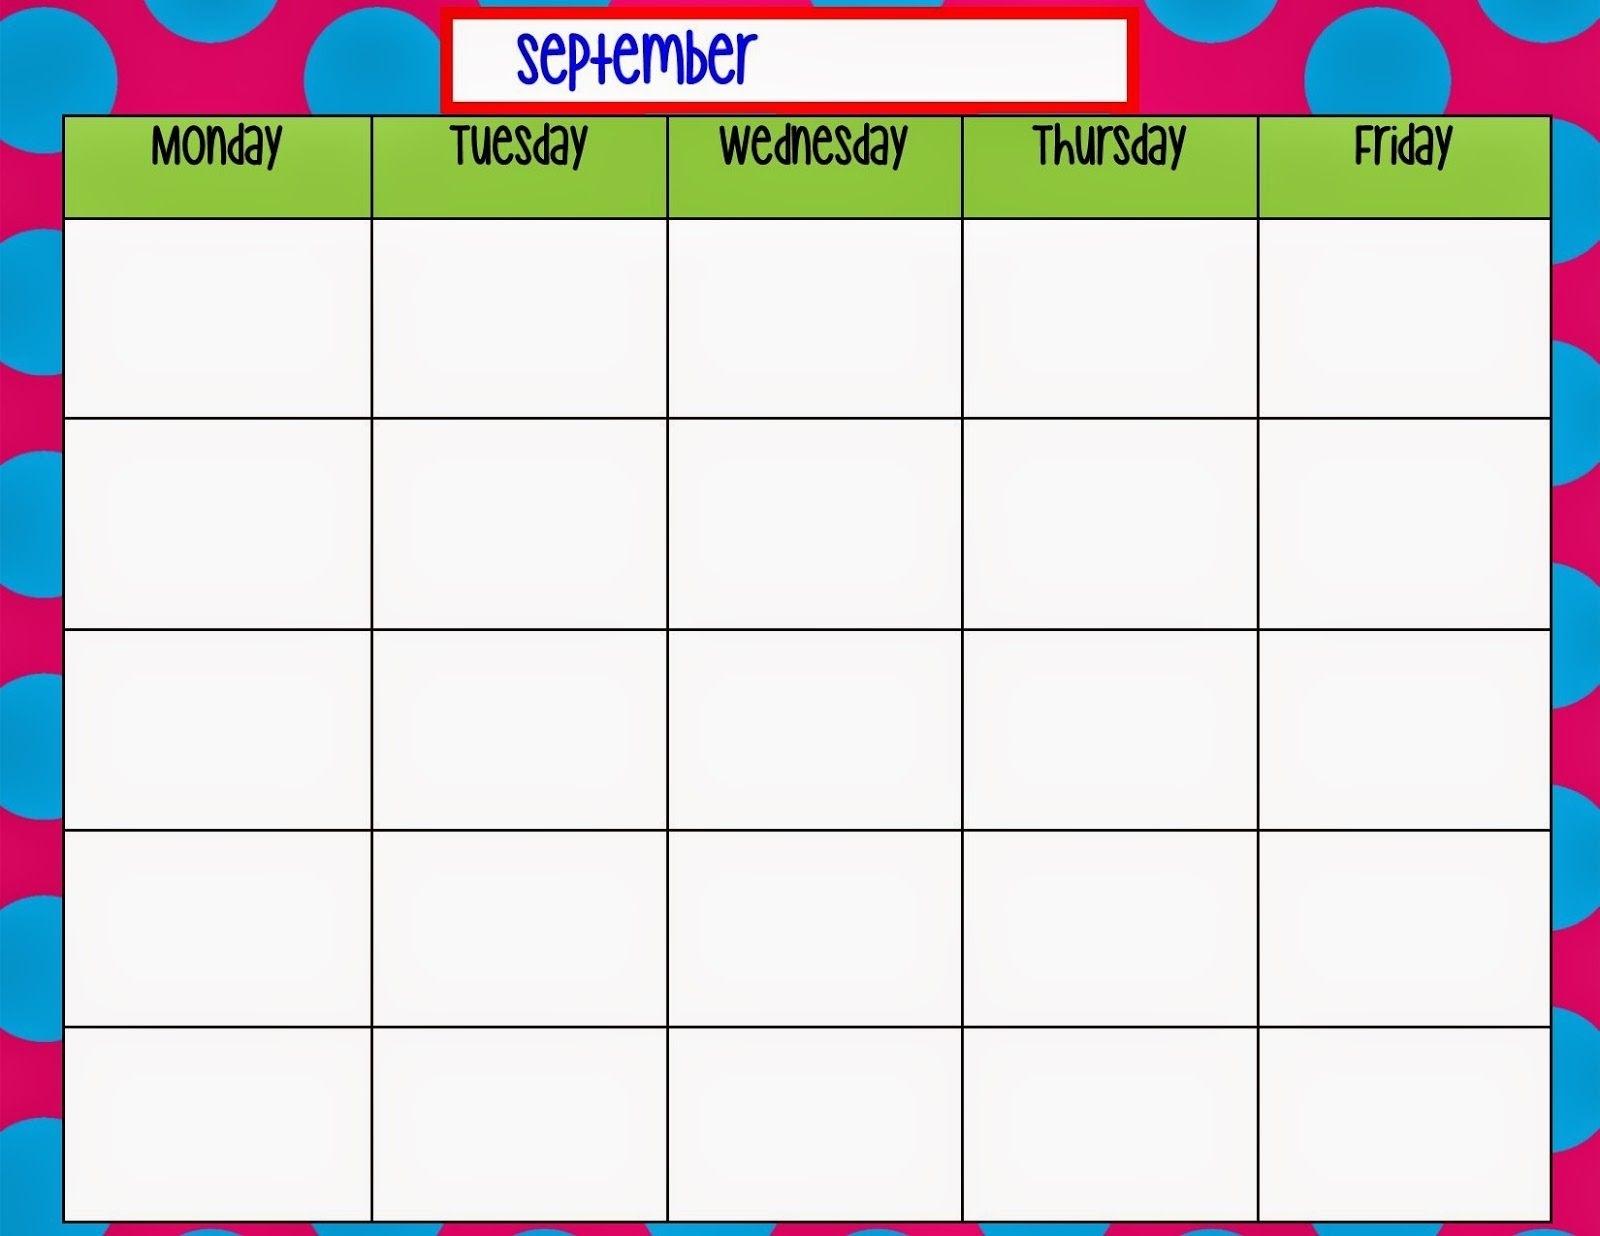 Monday Through Friday Calendar Template | Preschool | Pinterest  Calendar By Month Monday To Friday